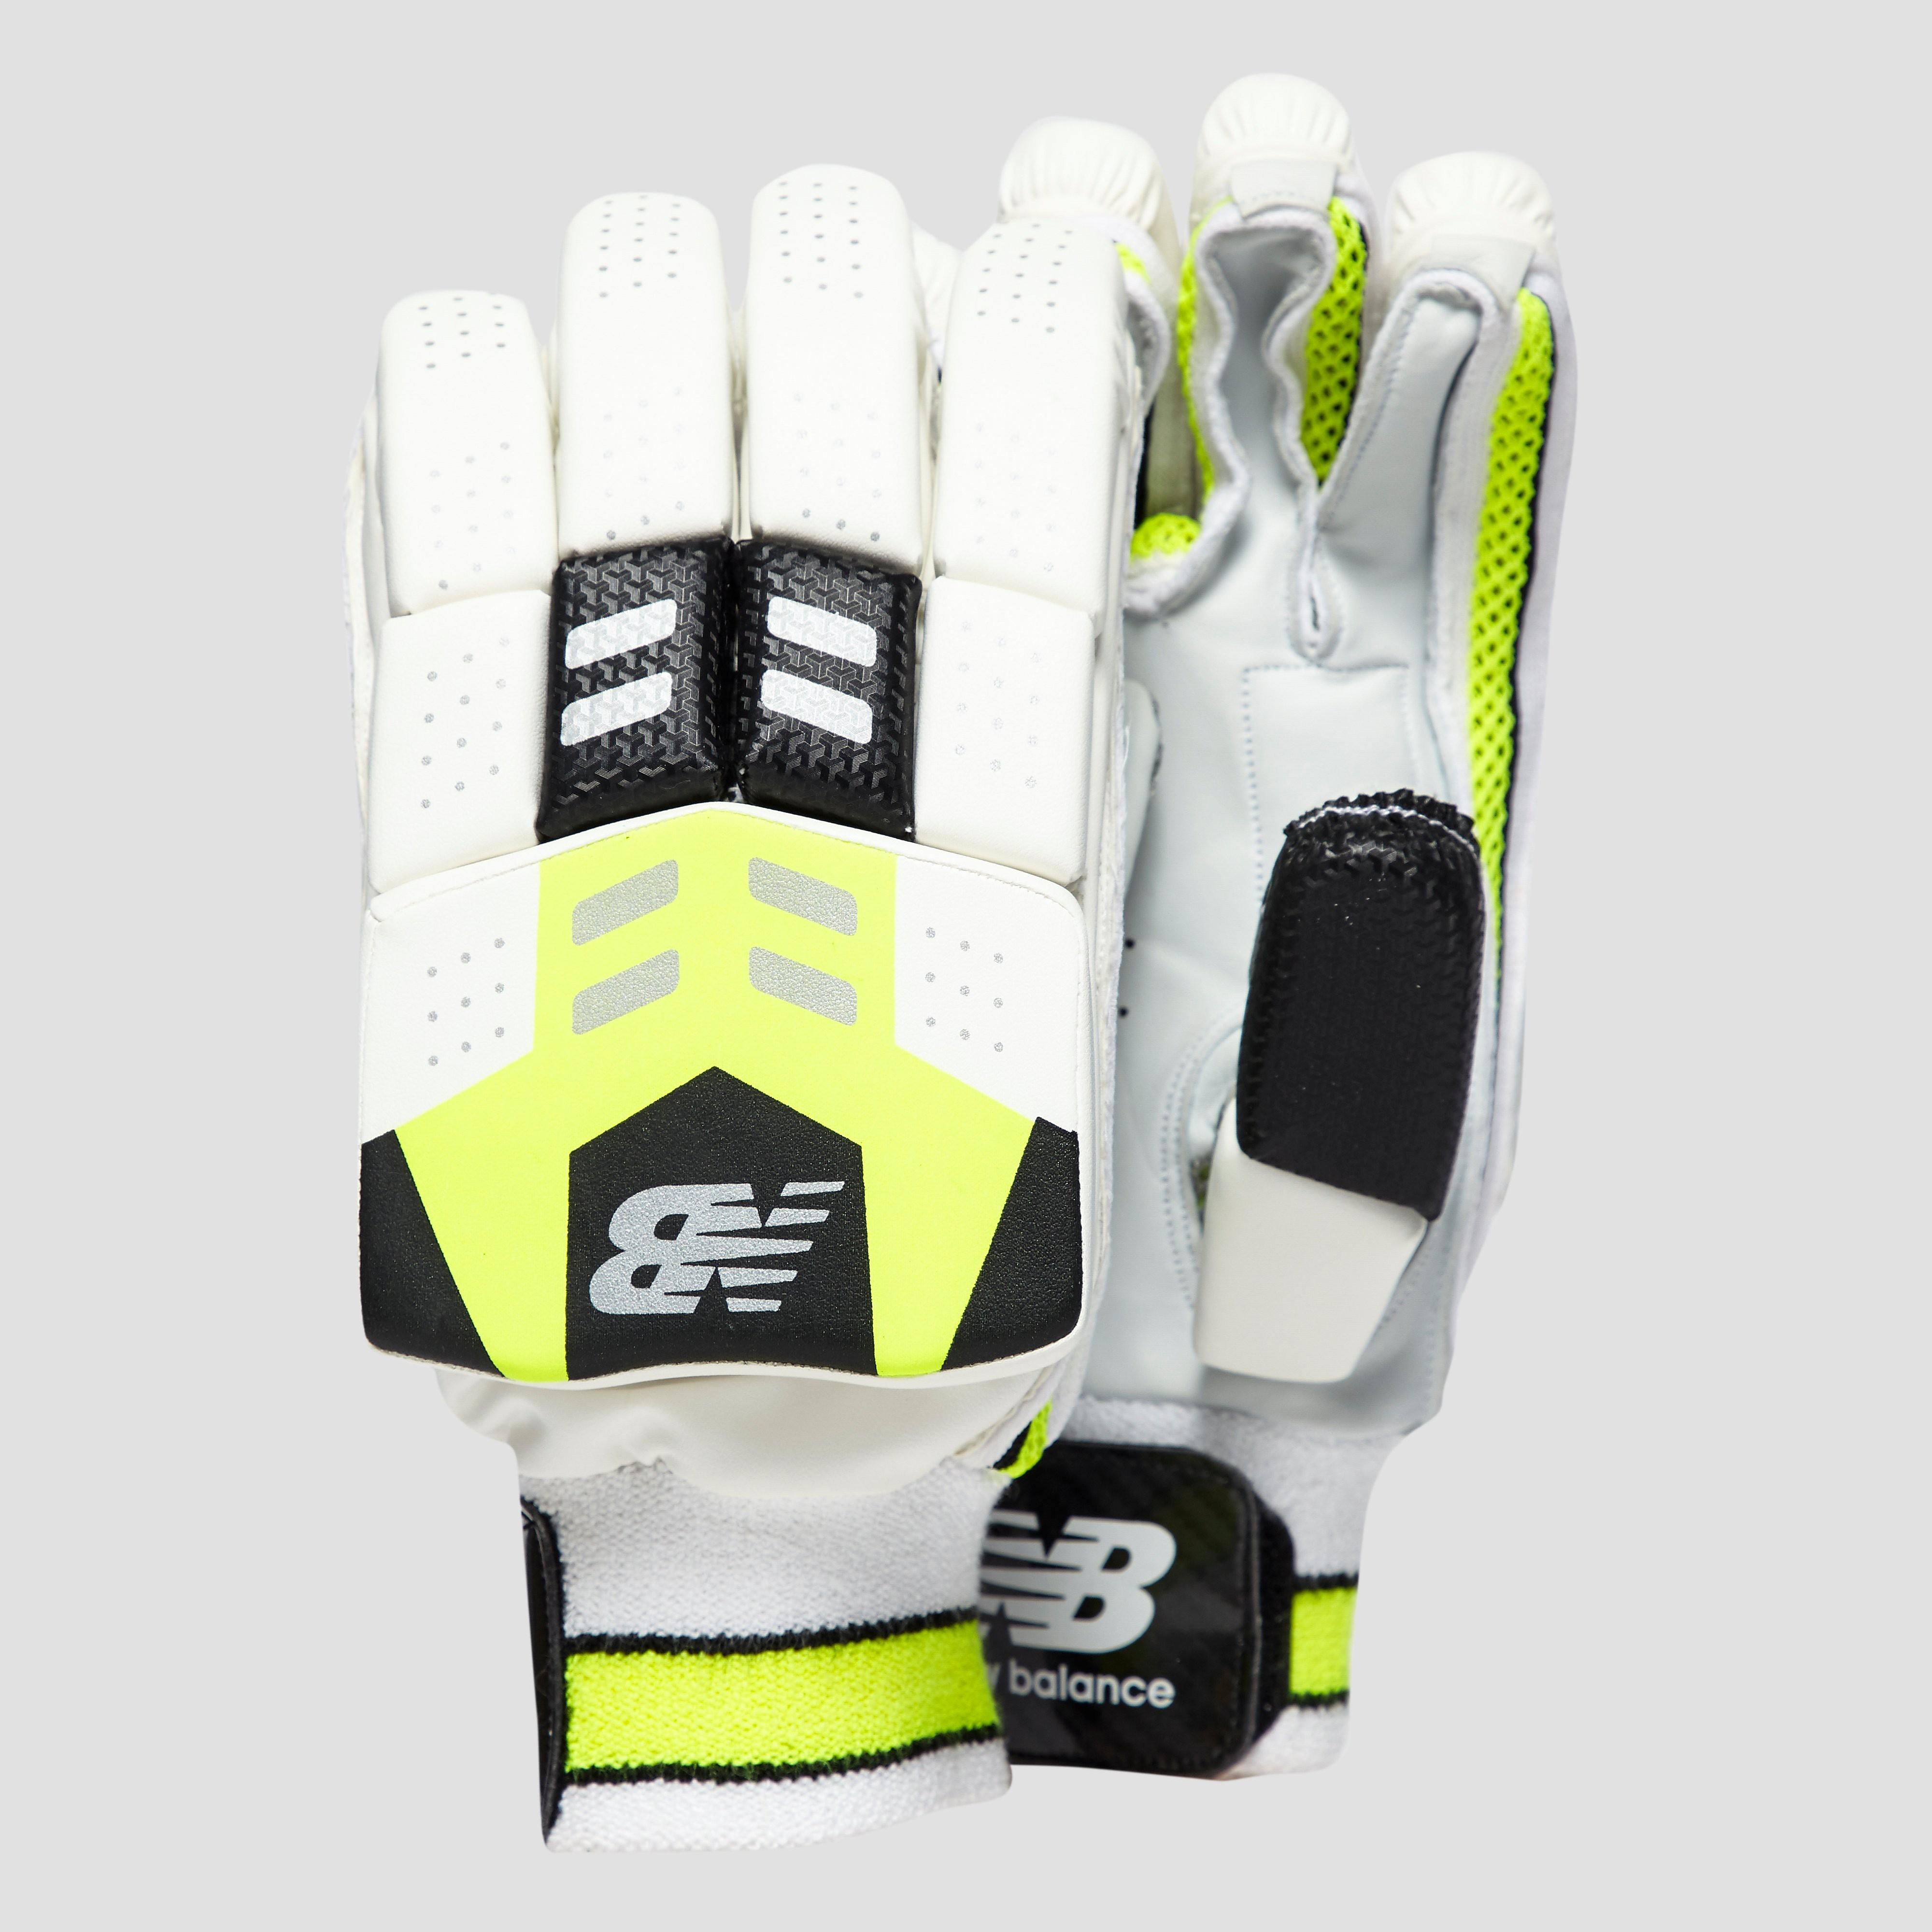 New Balance DC 580 Junior Batting Gloves